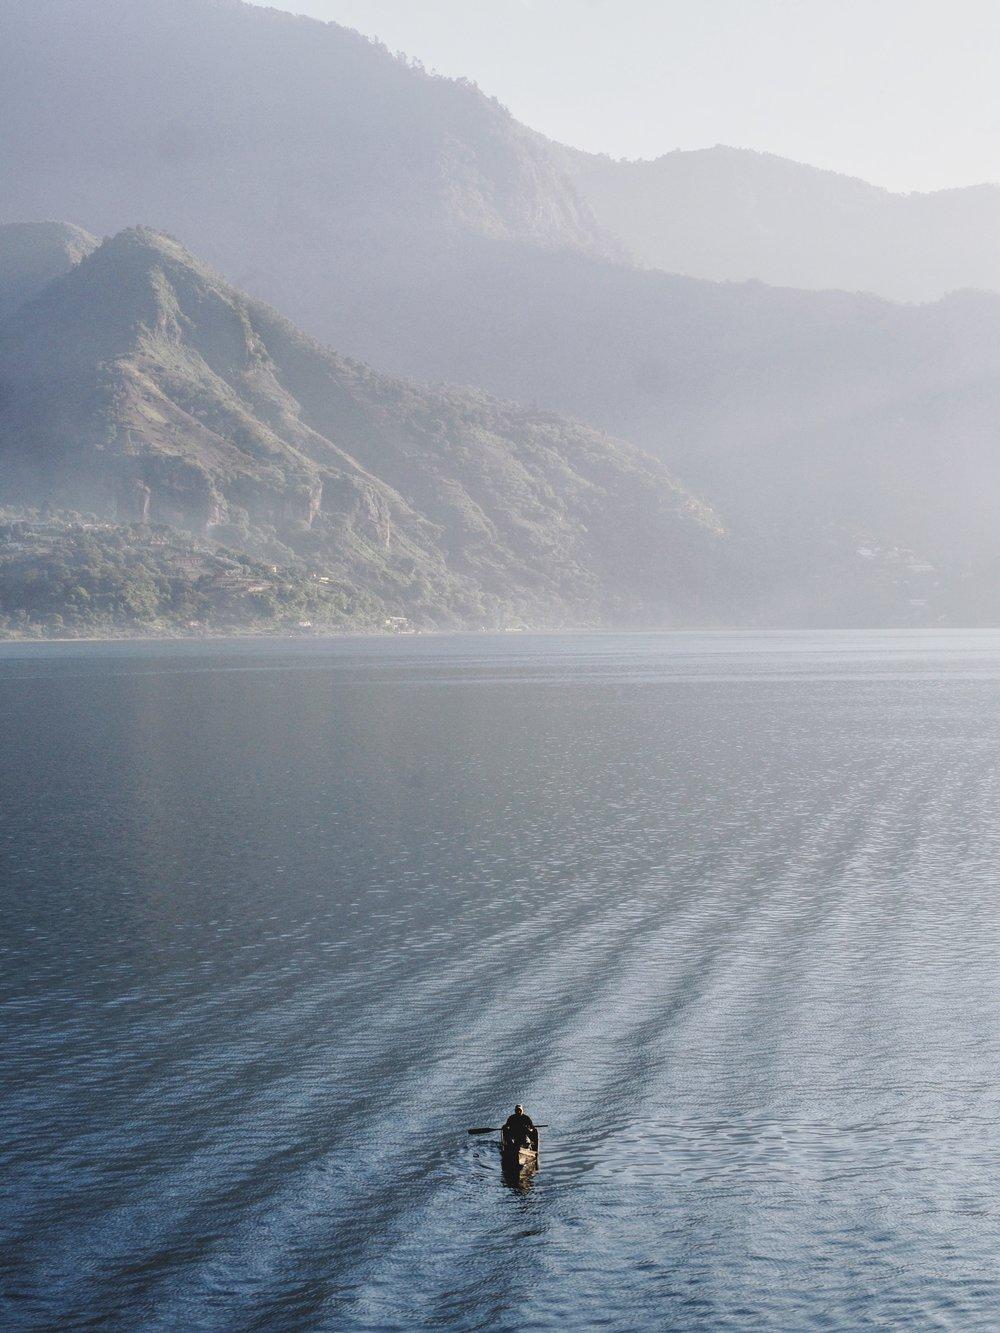 Fisherman on Lake Atitlán